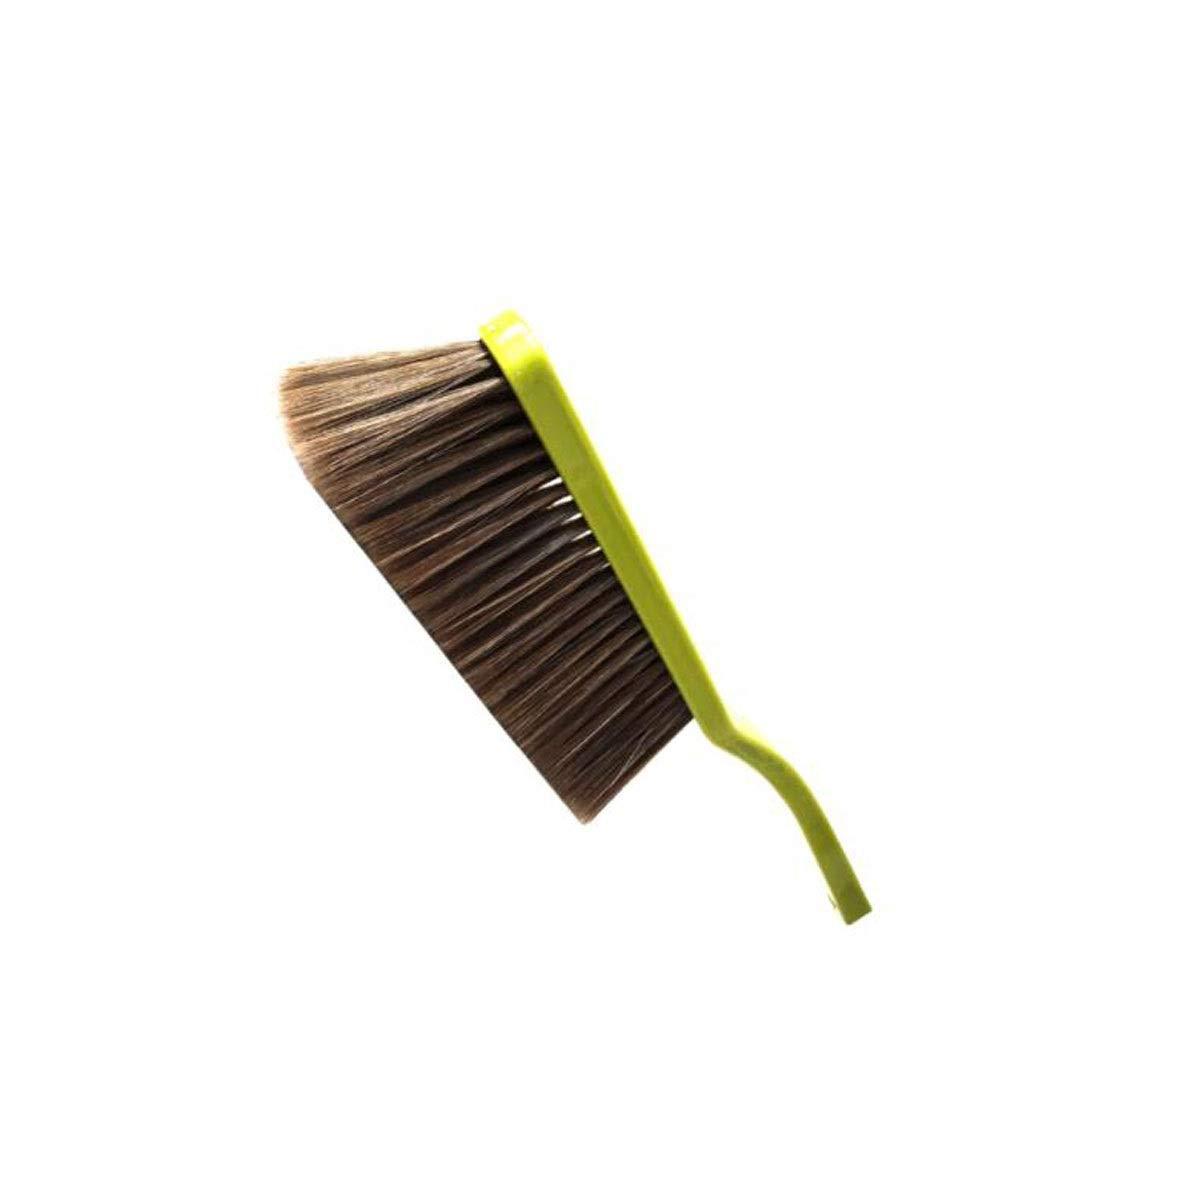 Tongboshi Bed Brush, Sweeping Durable Long Hair Bed Brush, Dusting Brush, Cleaning Brush, Green, White Bed Brush (Color : Pink)